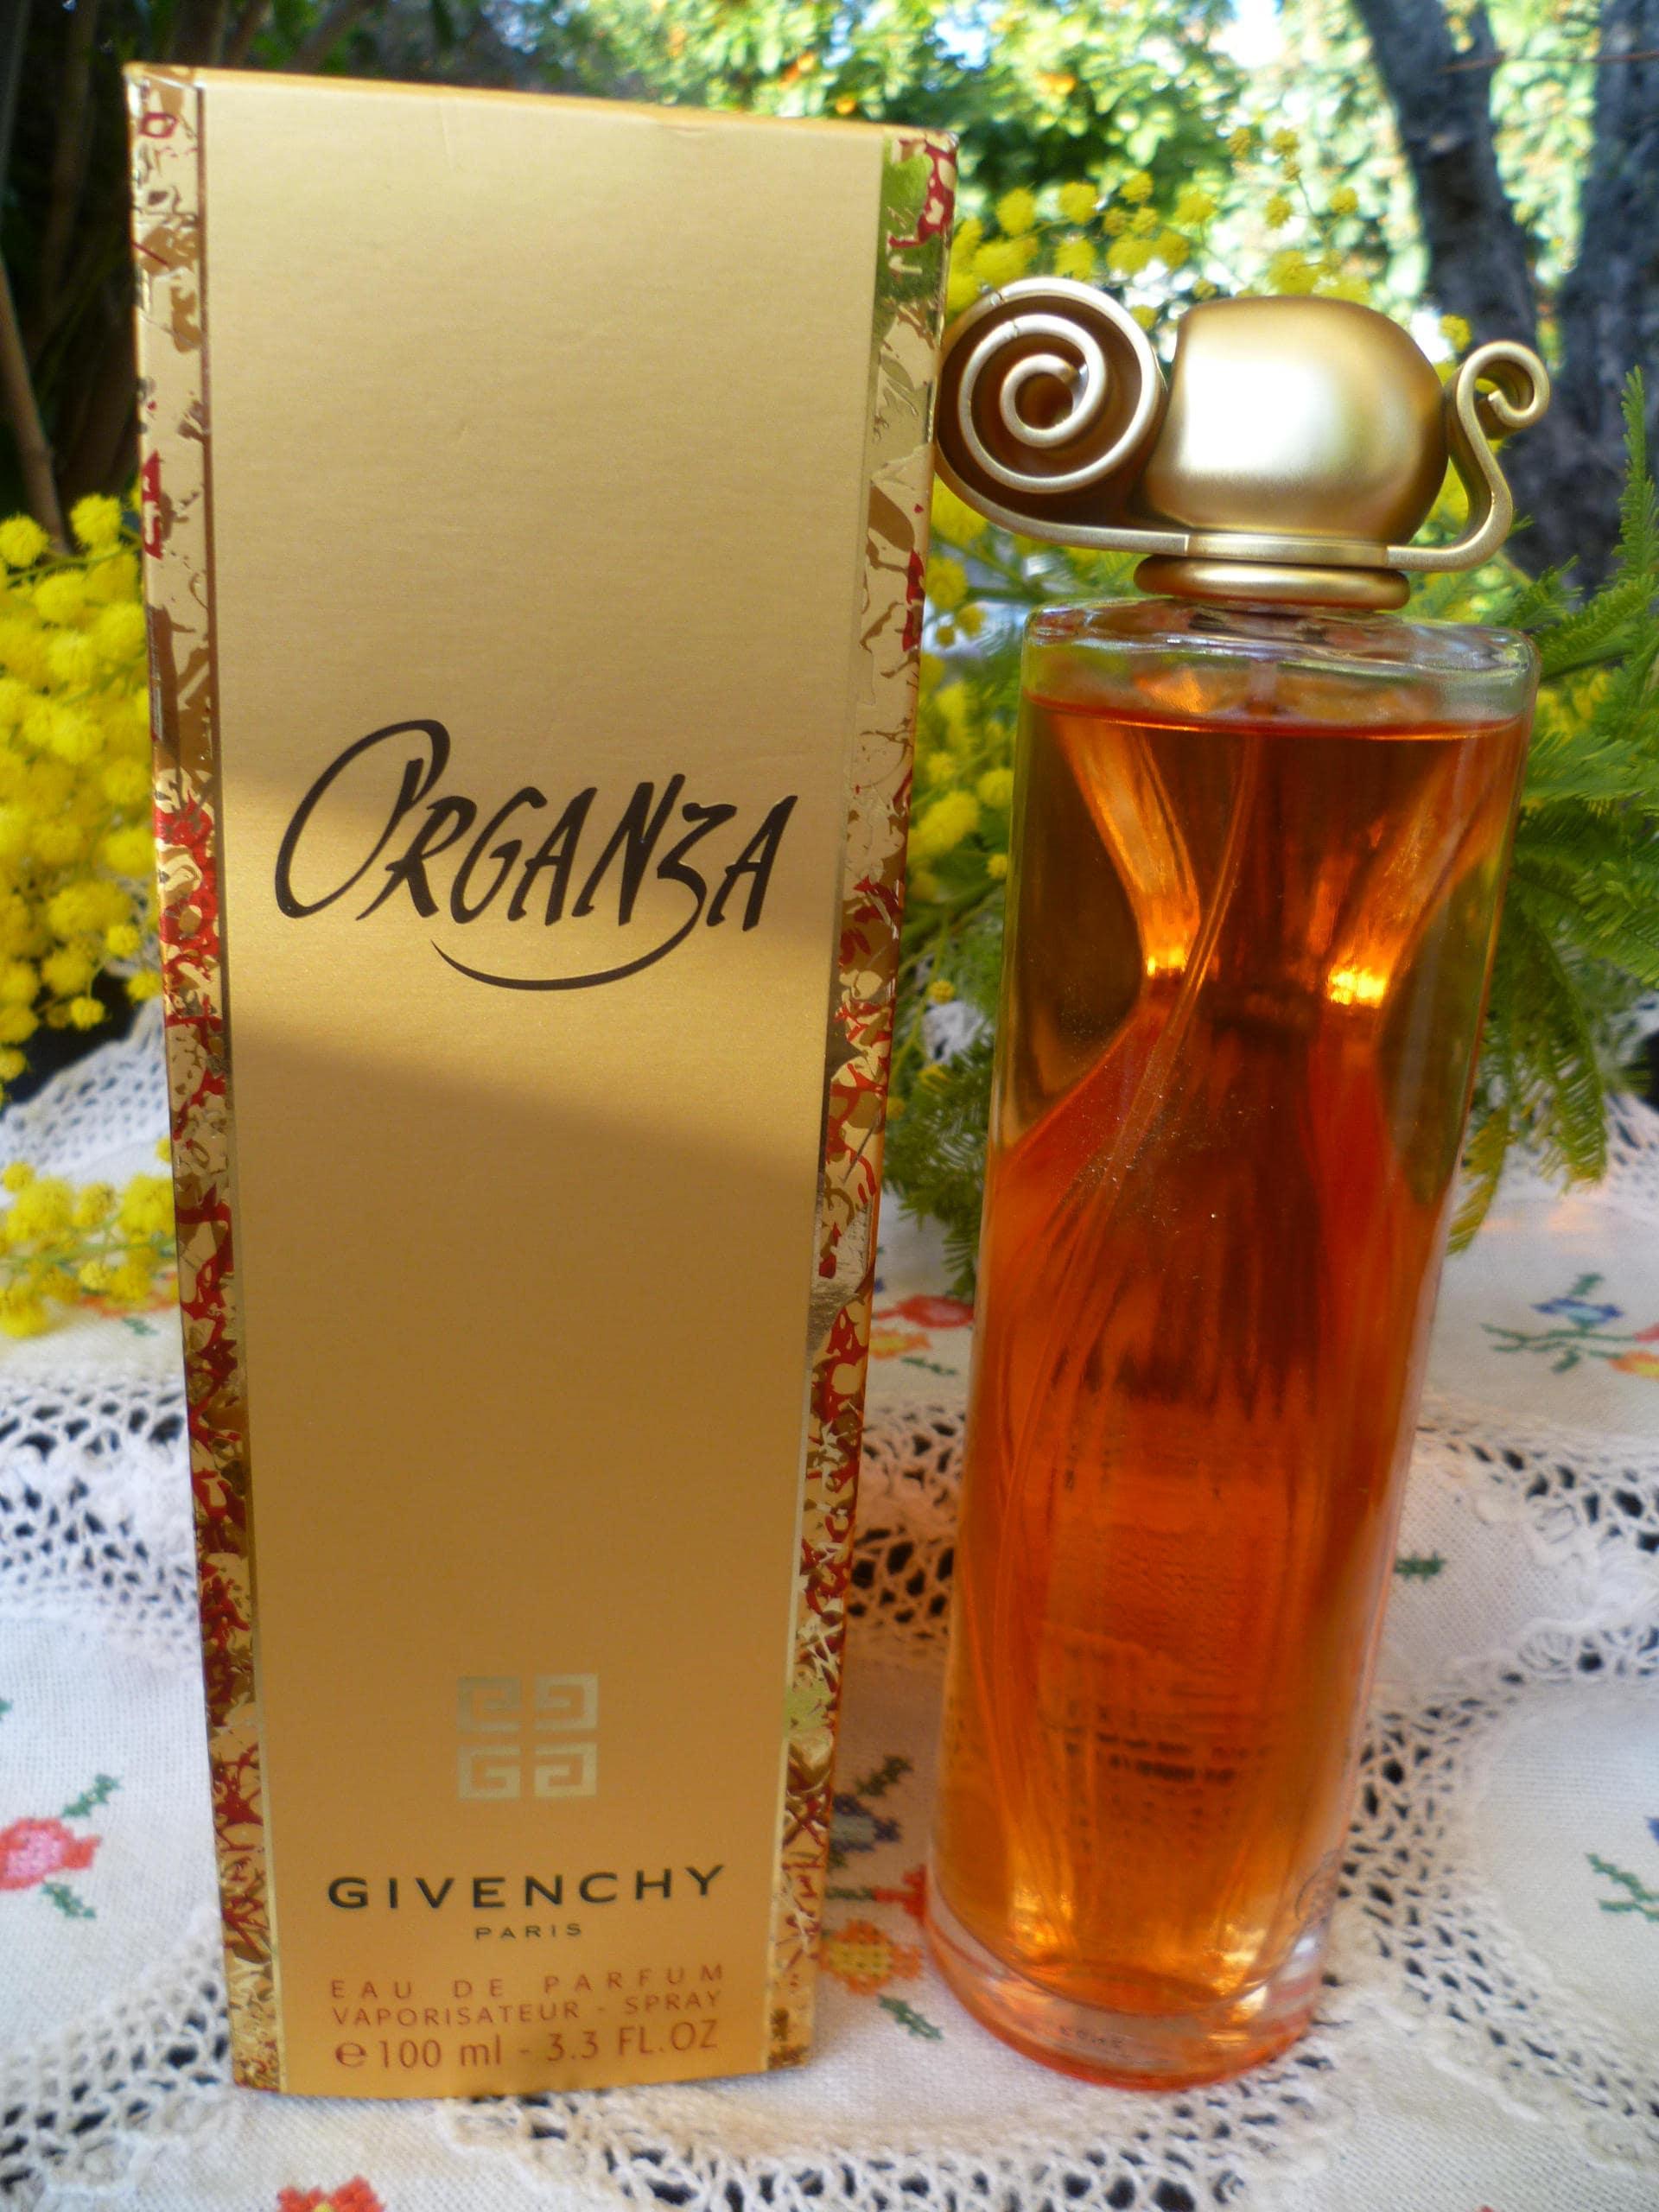 Givenchy Organza Parfum Eau Avec Plein Boite Parfums Presque De 100ml fYb6v7gy